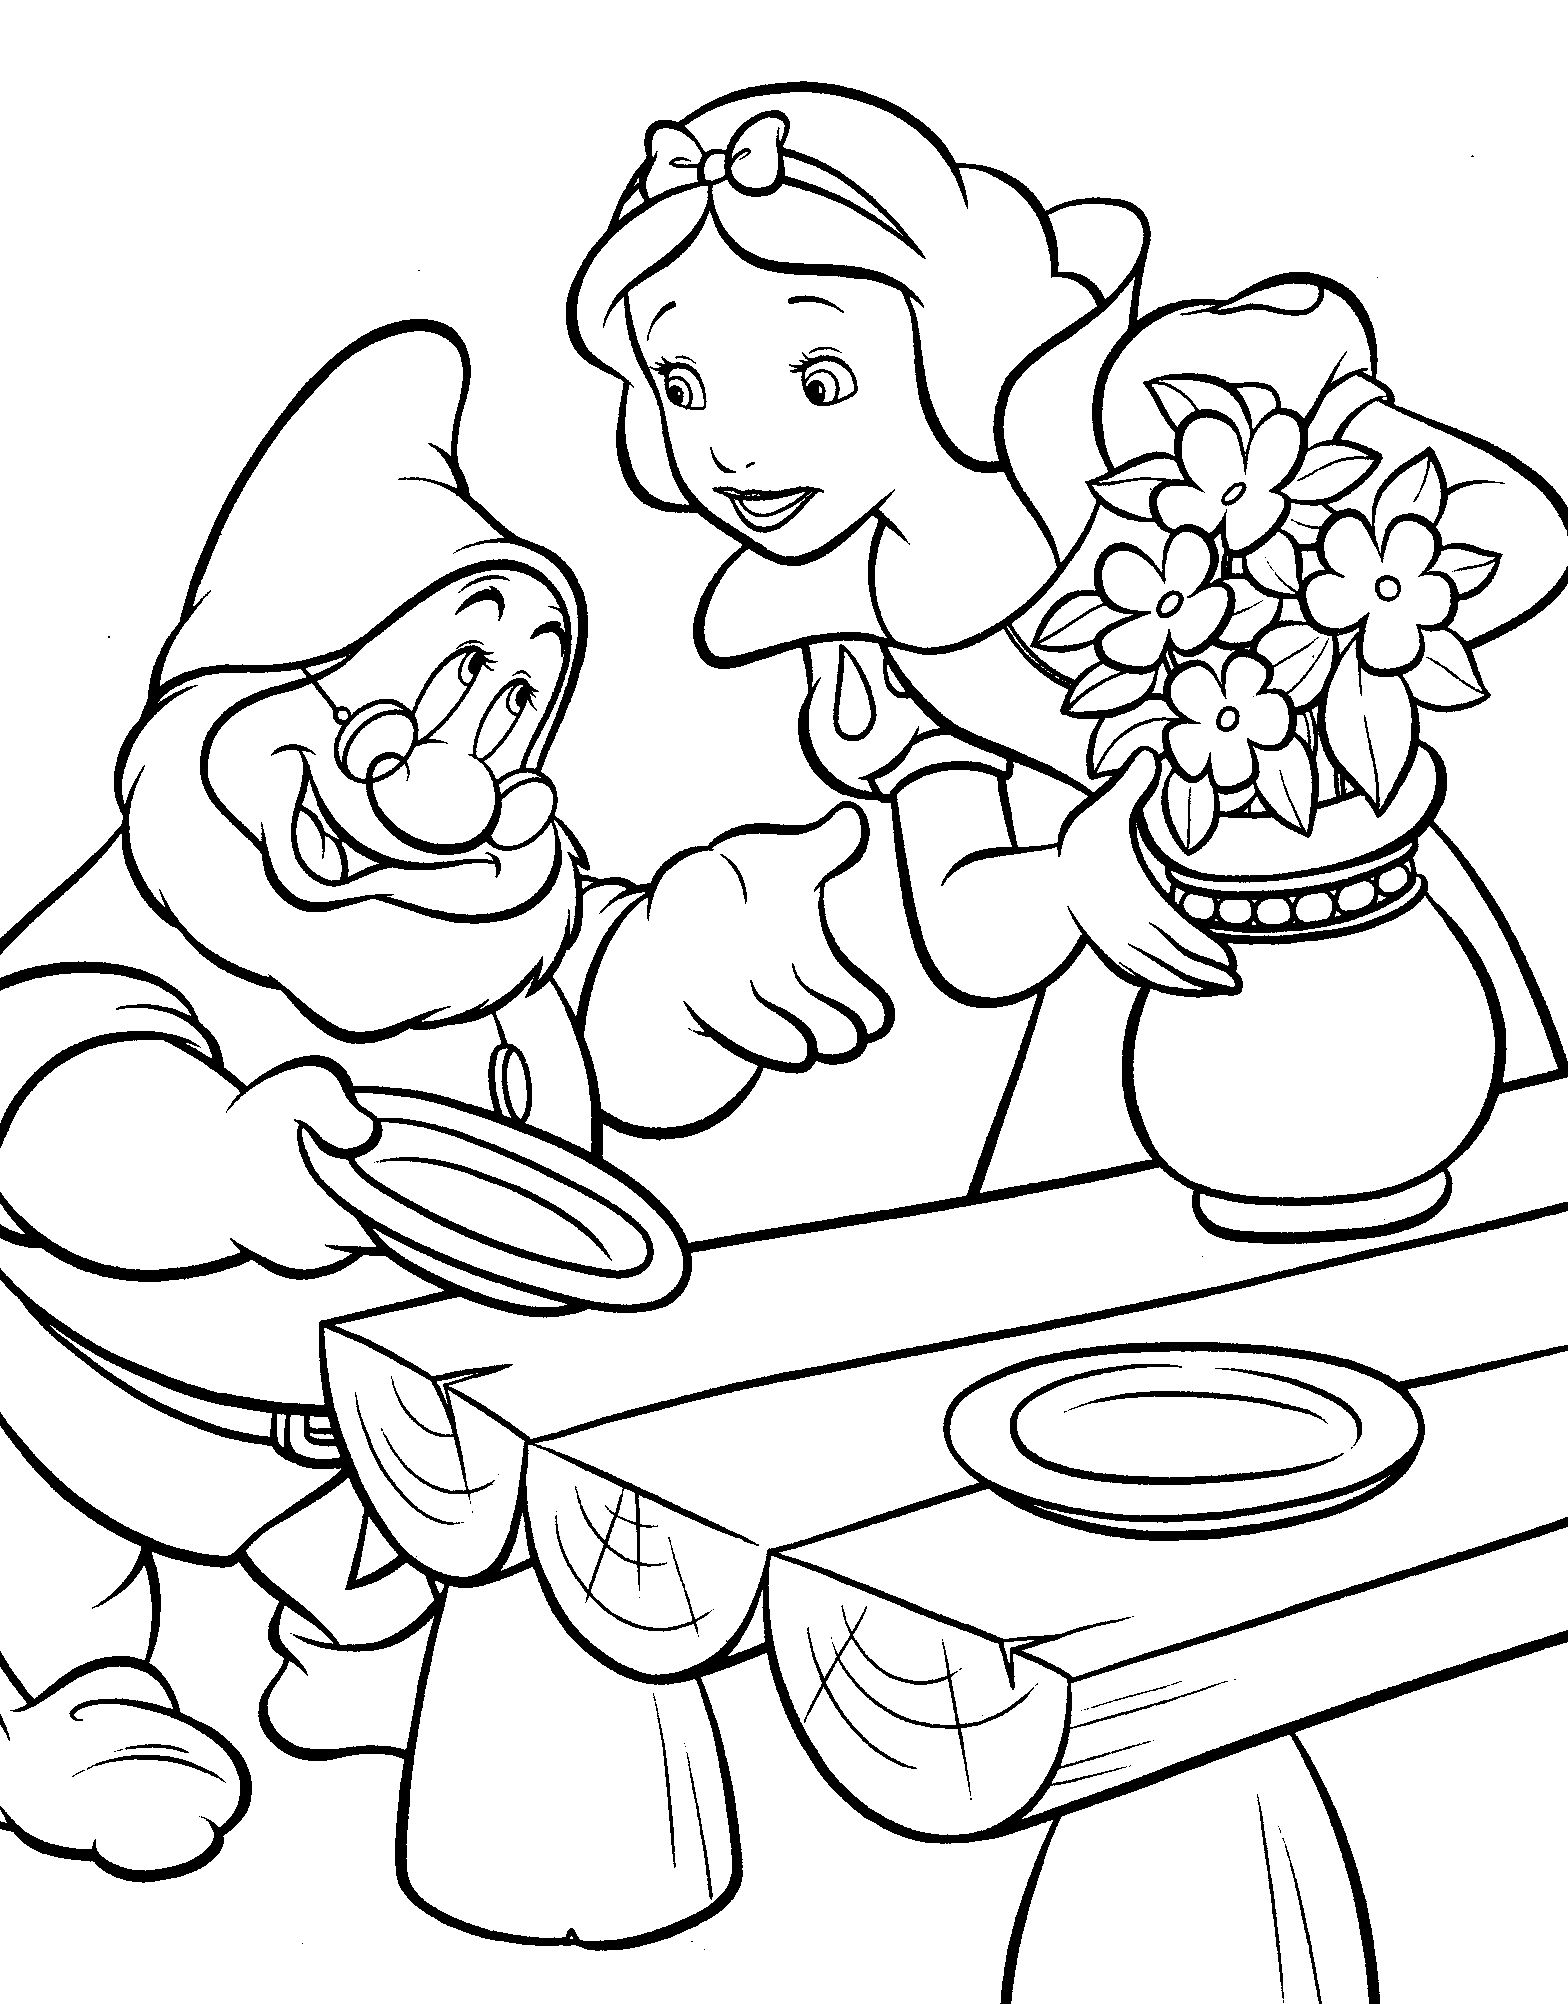 Snow White Ask For Food Coloring Pages For Kids F1z Printable Snow White Coloring Pages For Kids Prinses Kleurplaatjes Kleurboek Sneeuwwitje